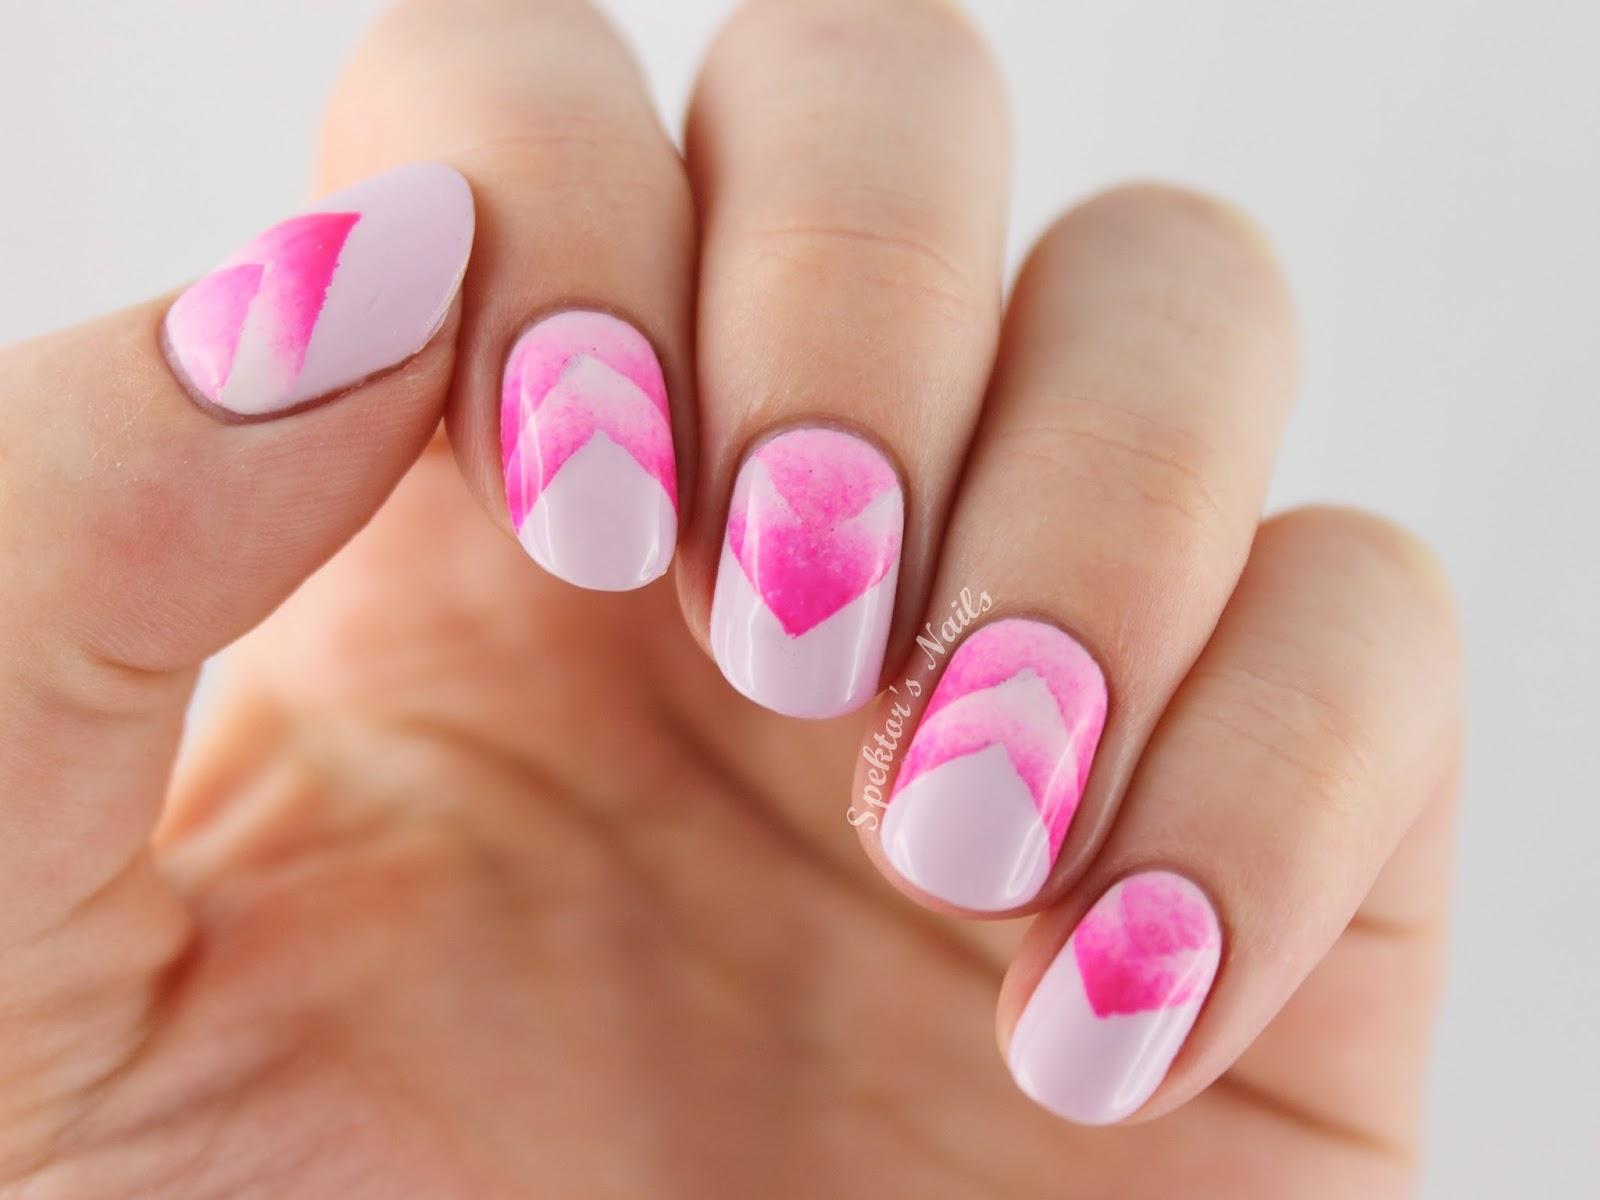 50 most beautiful gradient nail art design ideas pink and white chevron design gradient nail art prinsesfo Choice Image